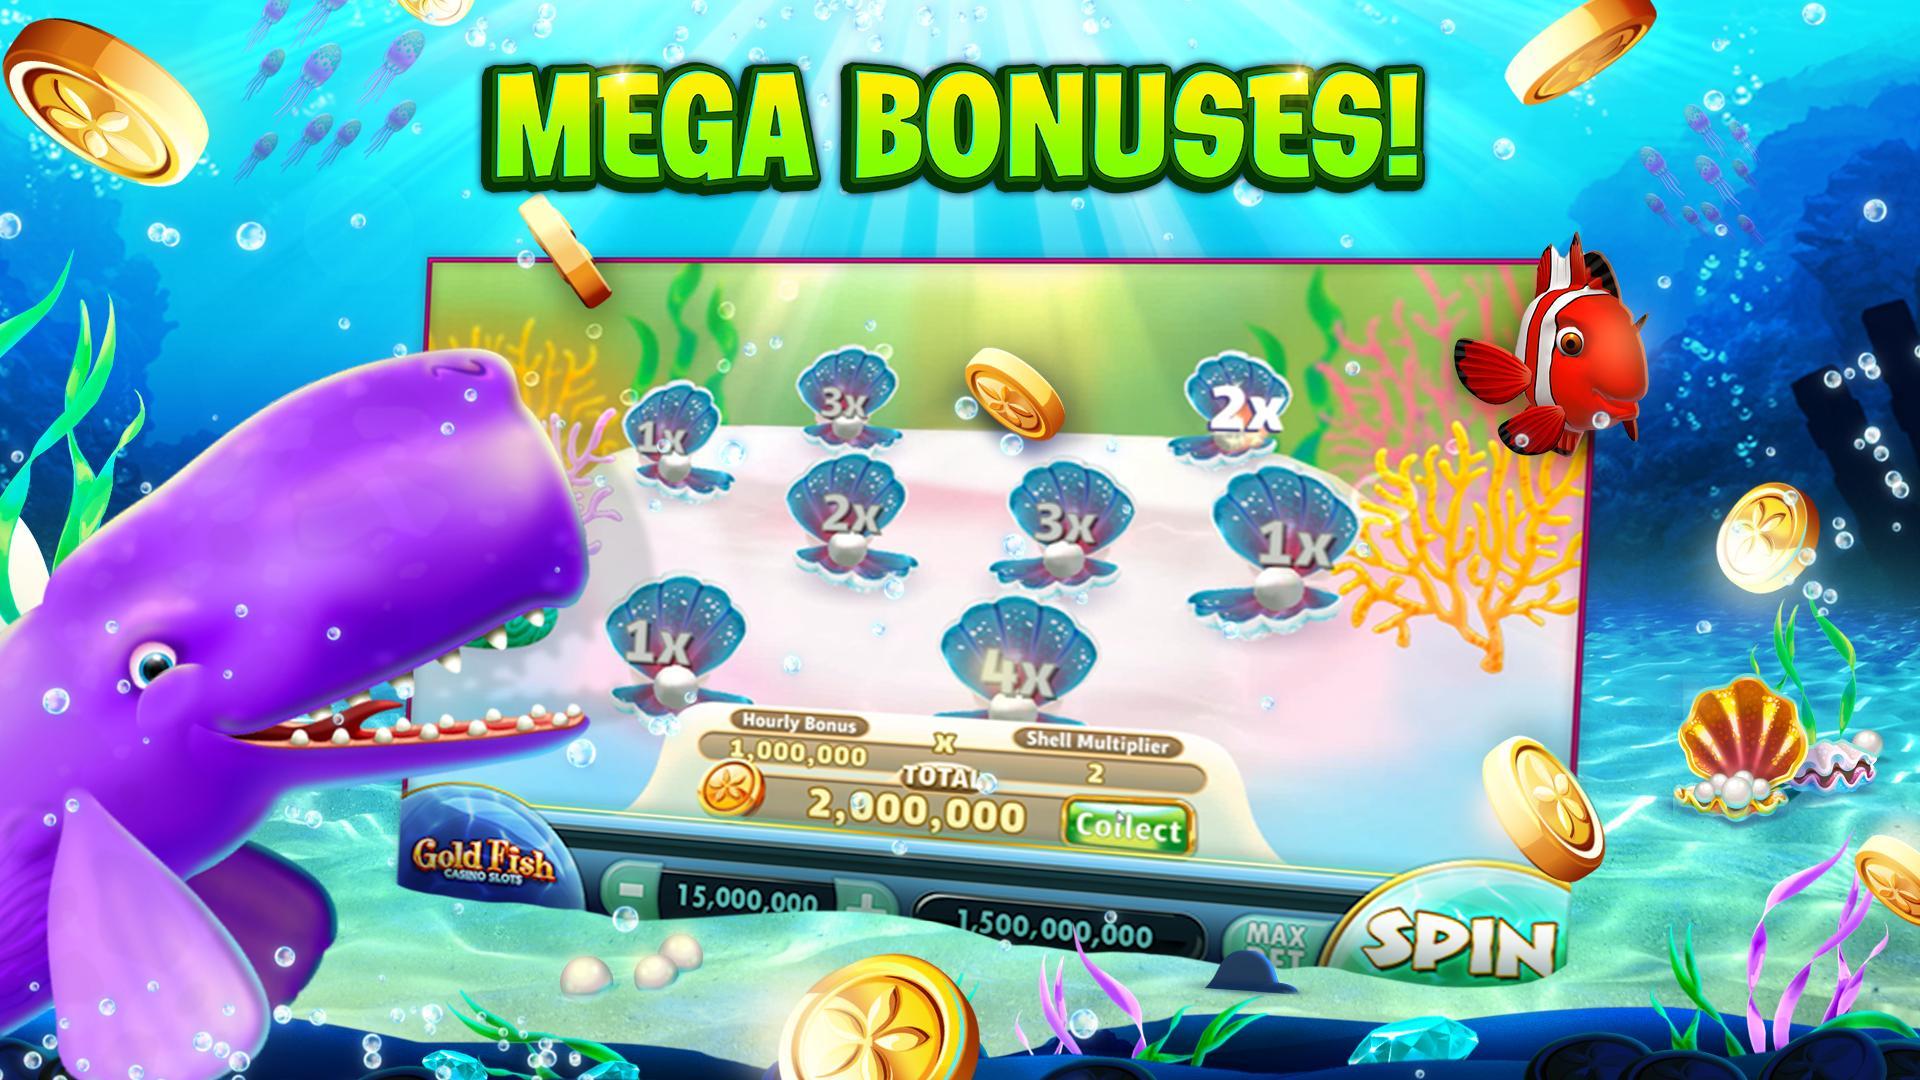 Gold Fish Casino Slots - FREE Slot Machine Games 25.09.00 Screenshot 11